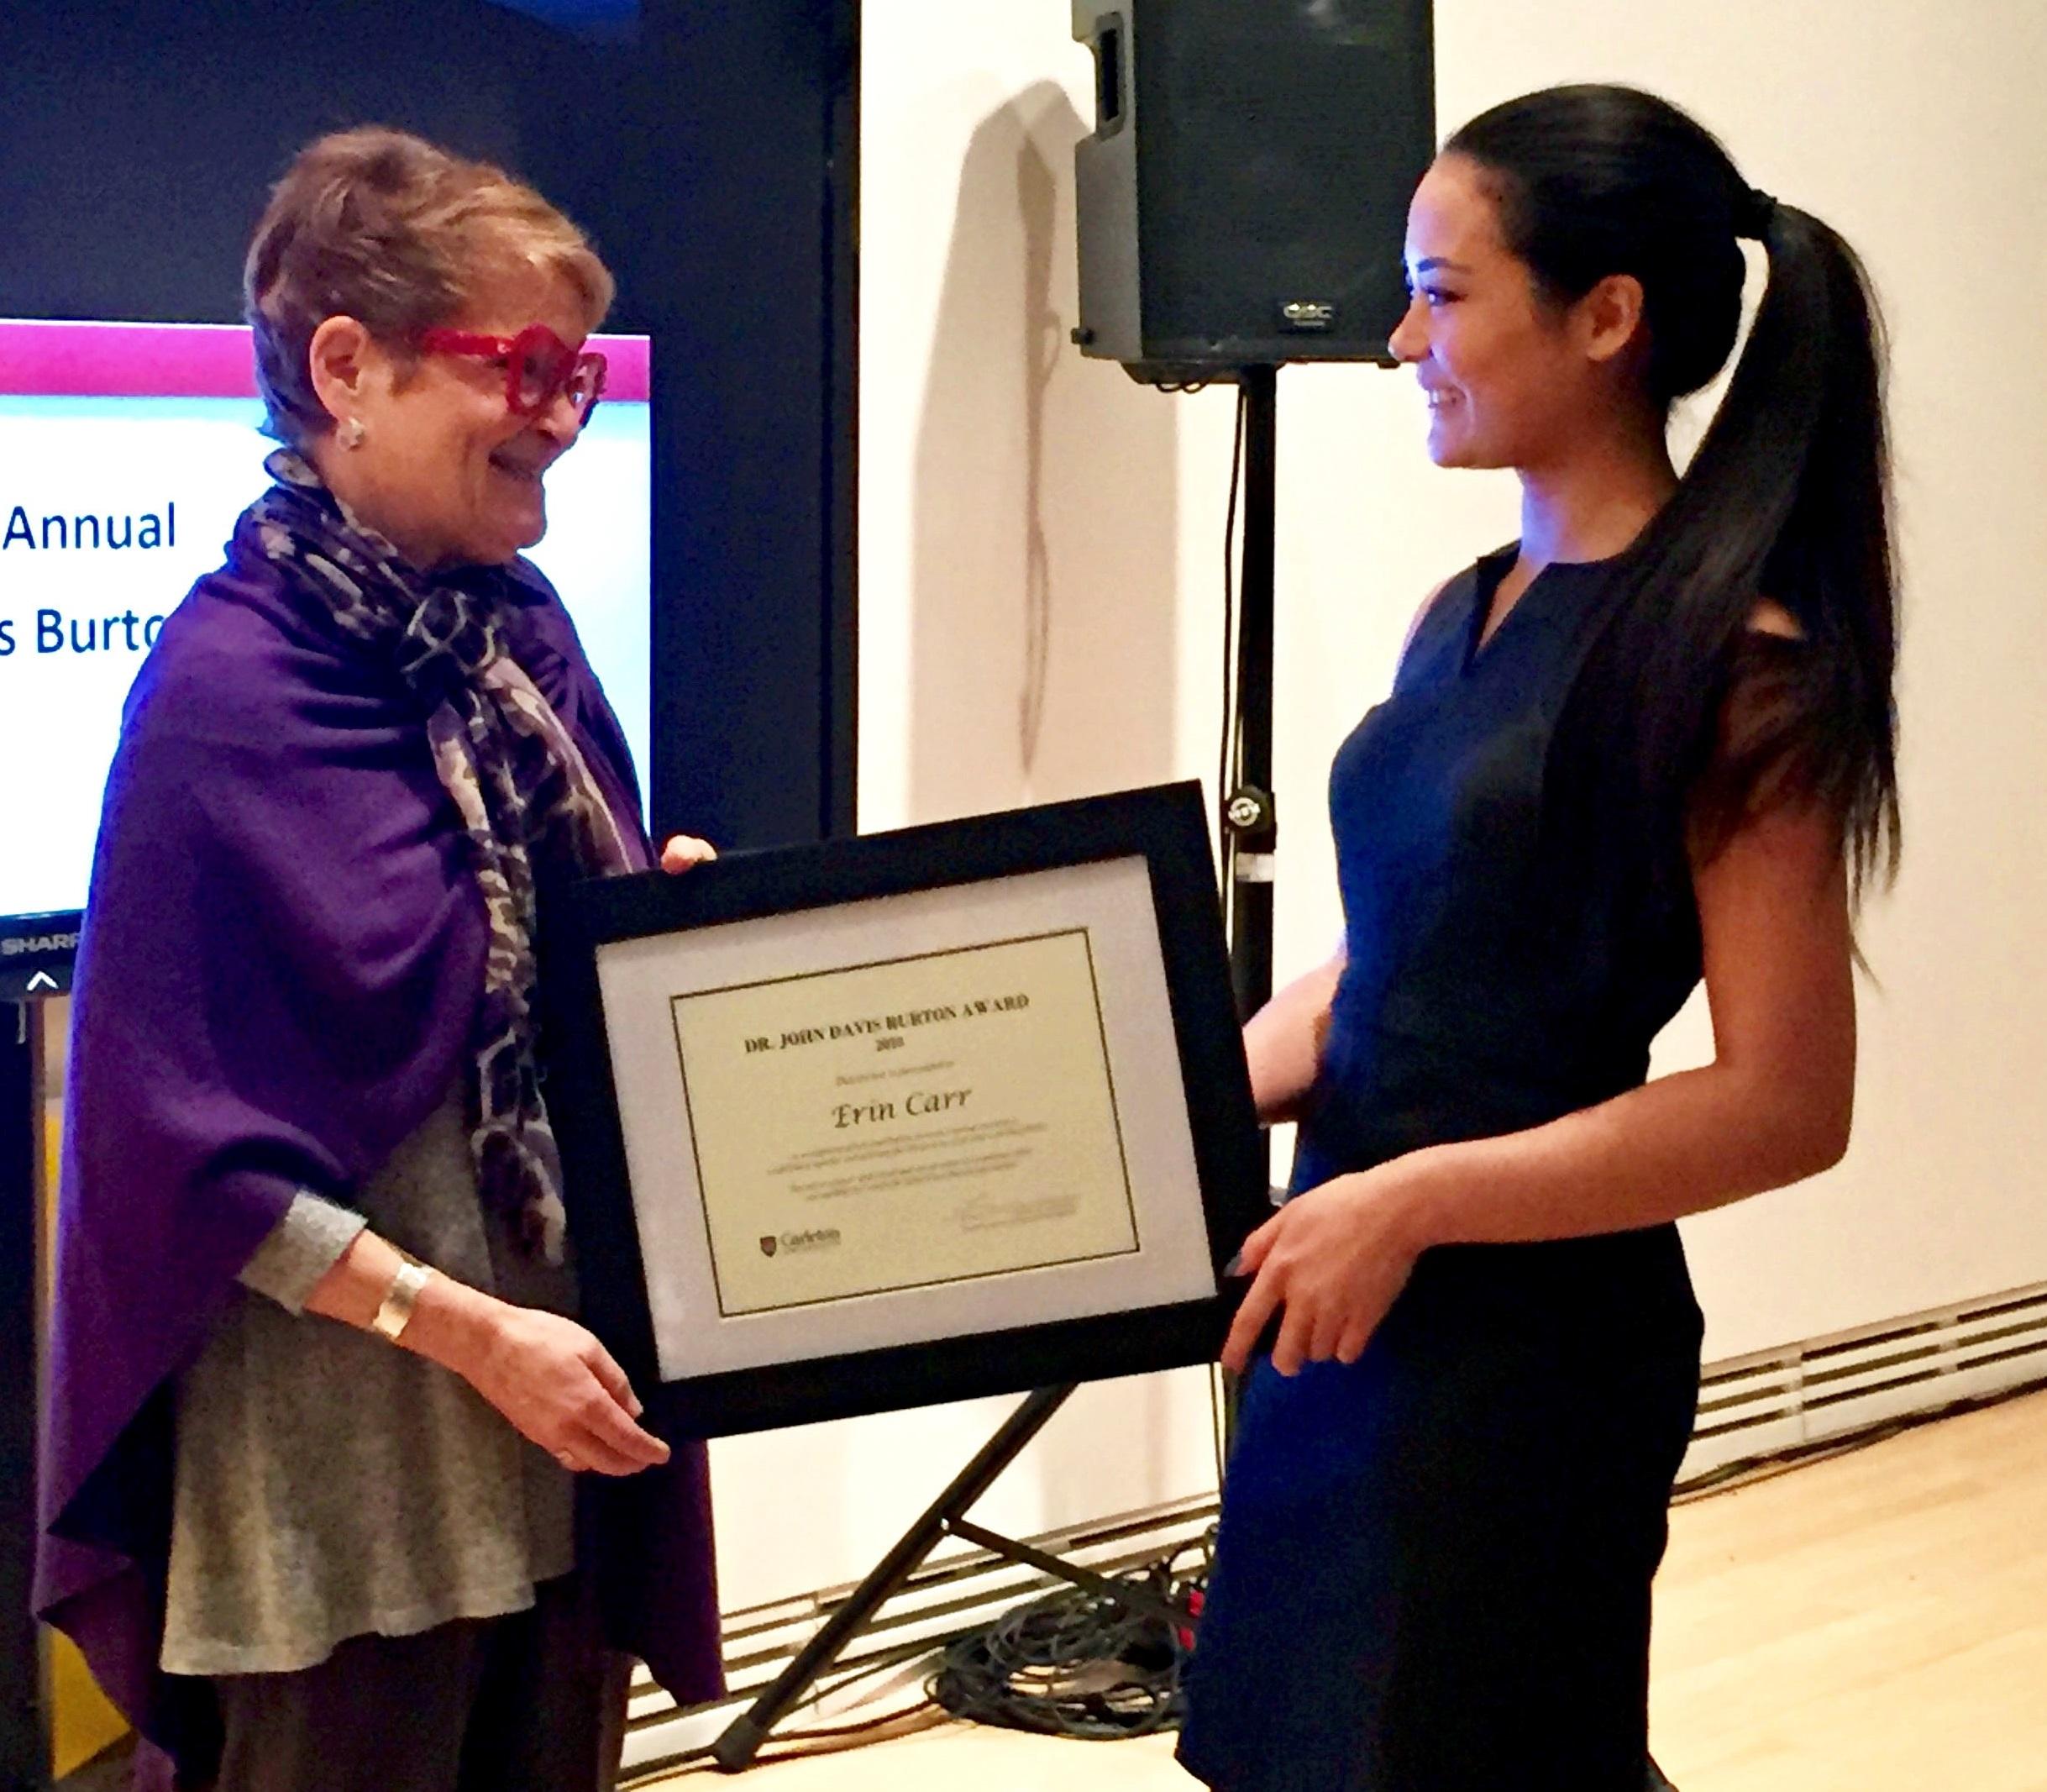 Dr. John Davis Burton Award ceremony